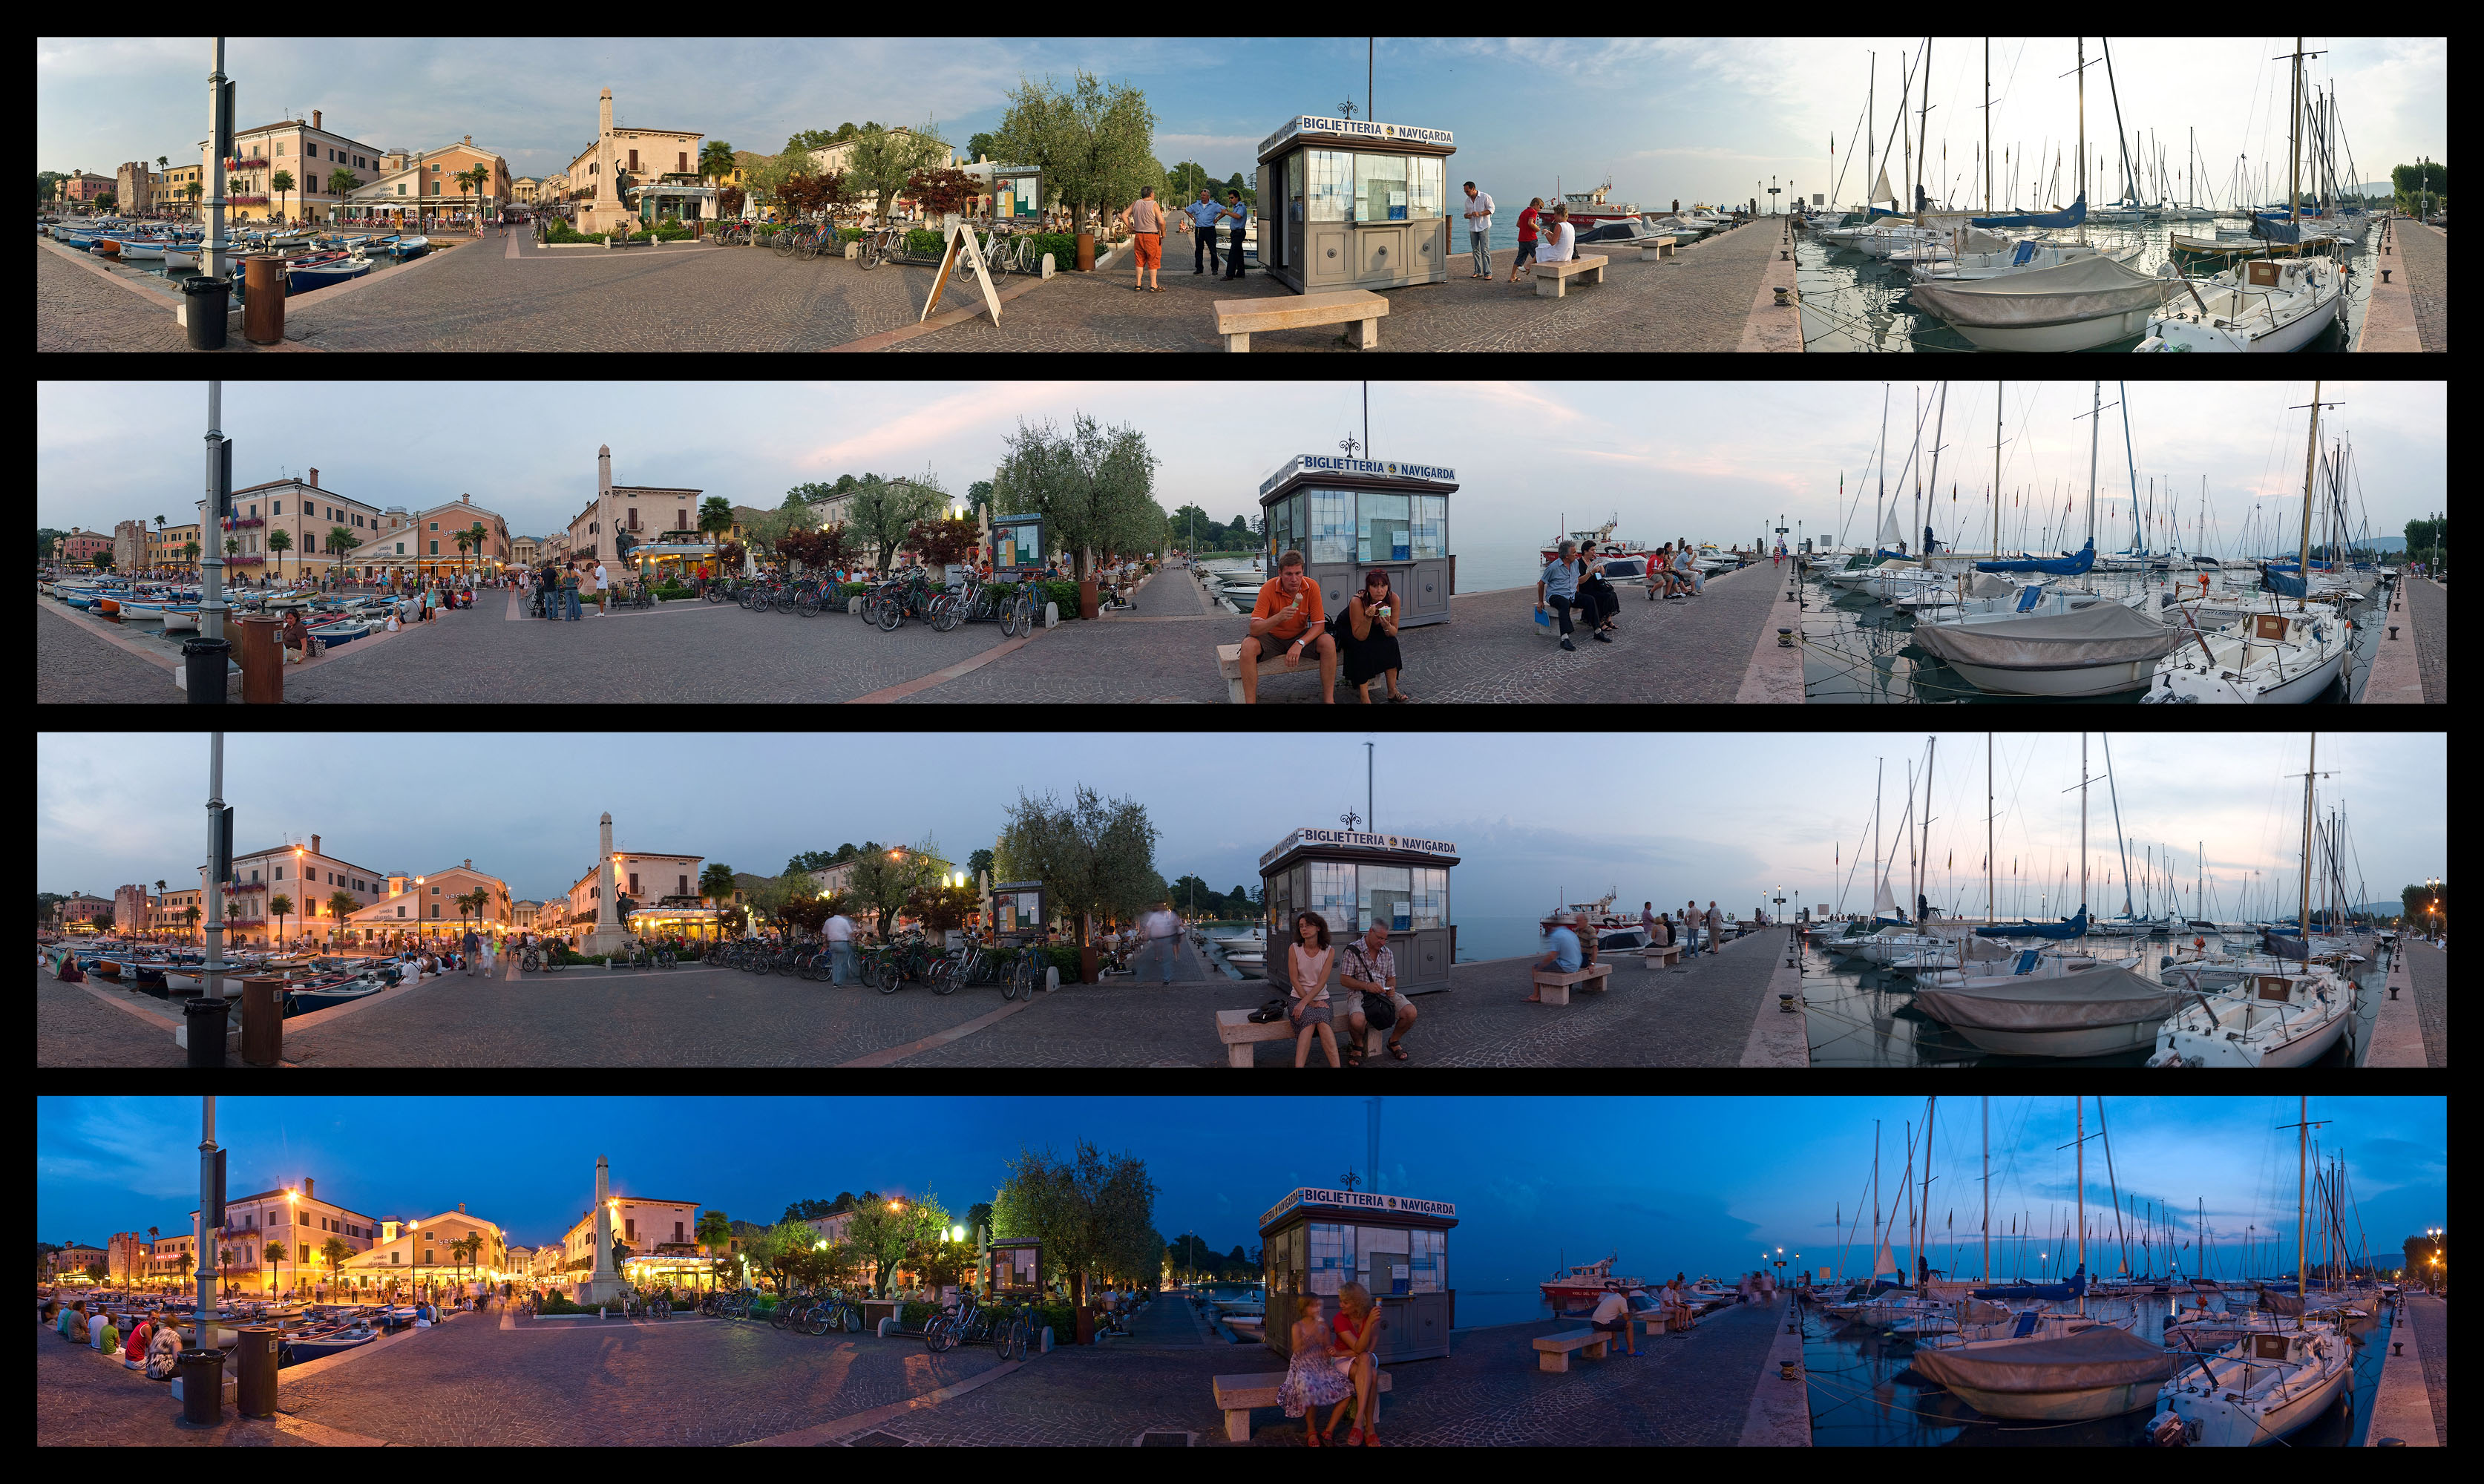 Bardolino harbor - into the night (large version)